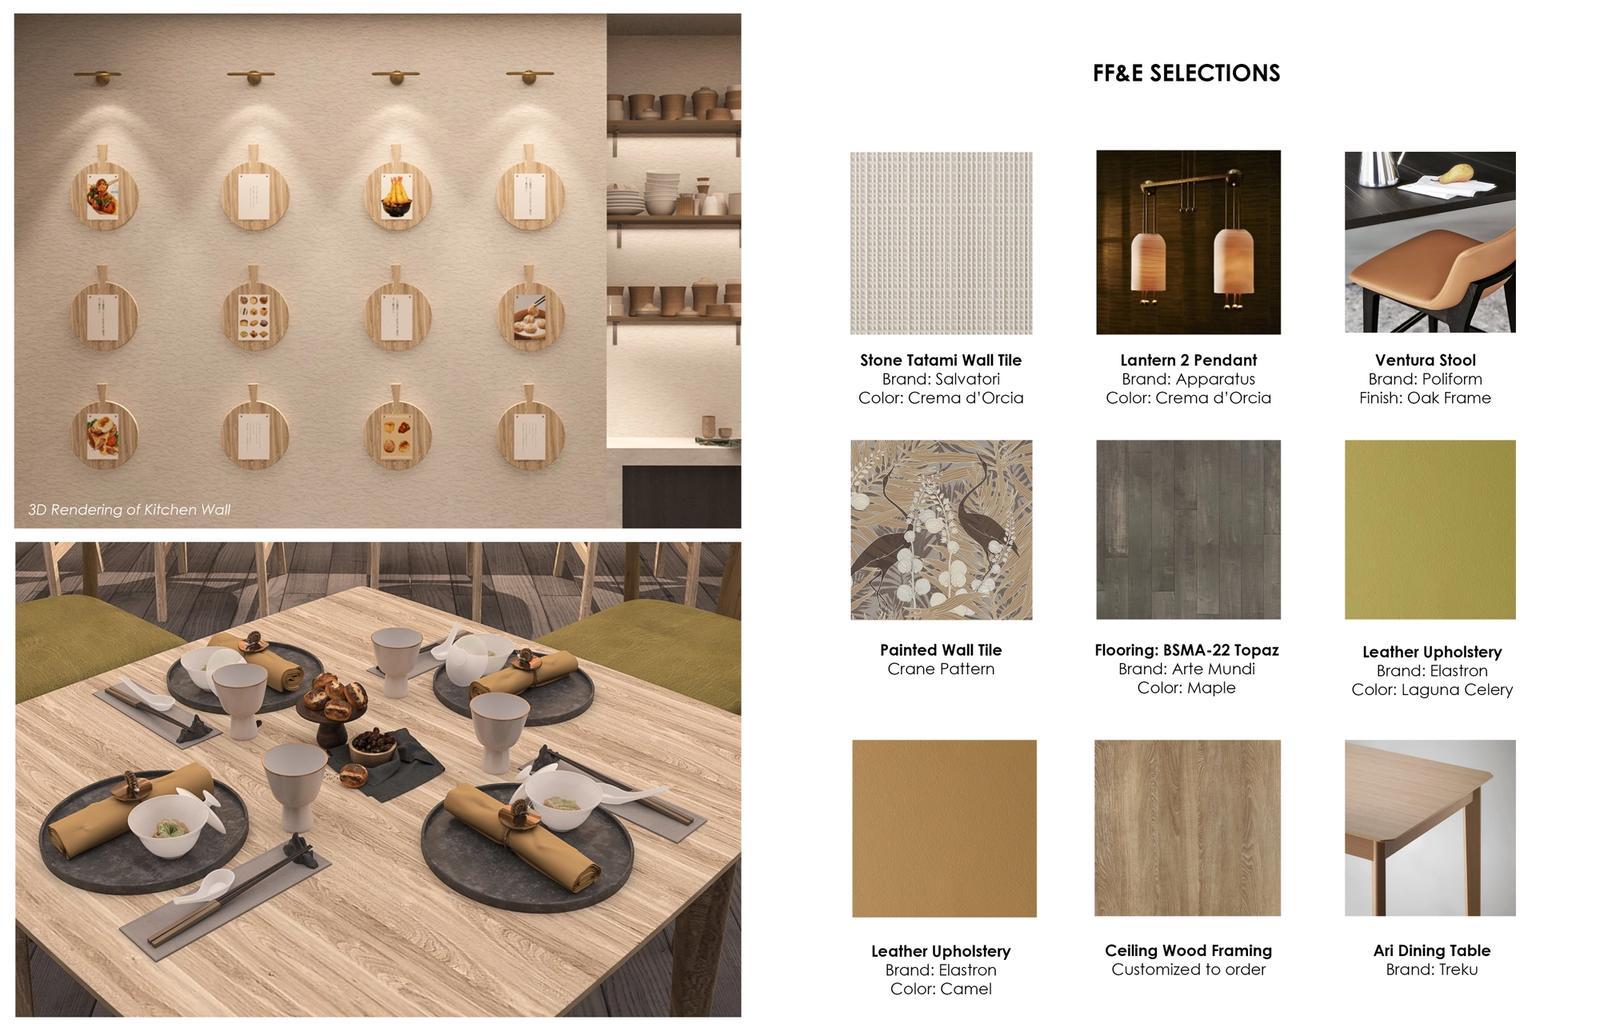 Jikan Galleria - Restaurant Details